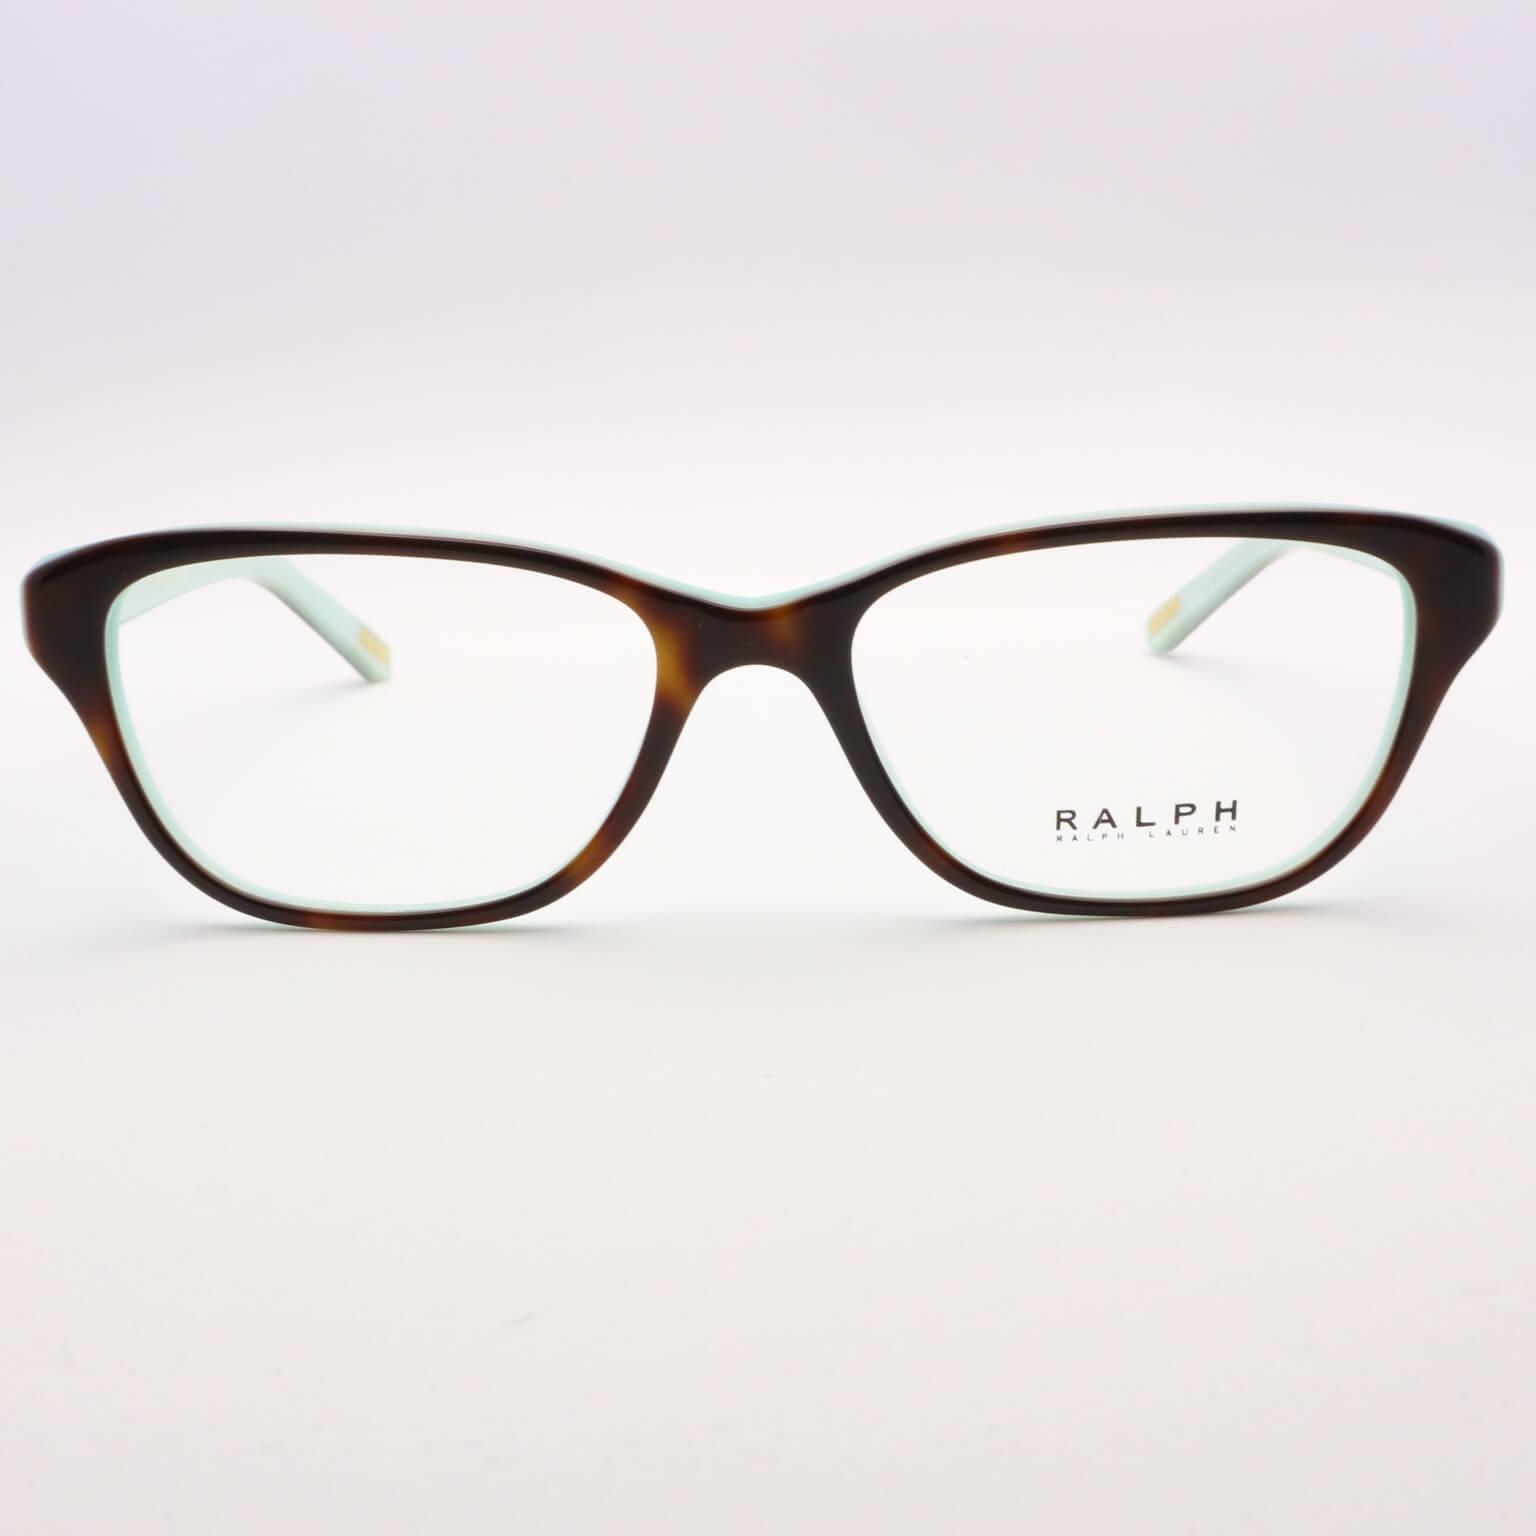 4982e9aac0 Γυαλιά οράσεως Ralph by Ralph Lauren 7020 601 ~ Οπτικά Eyelab